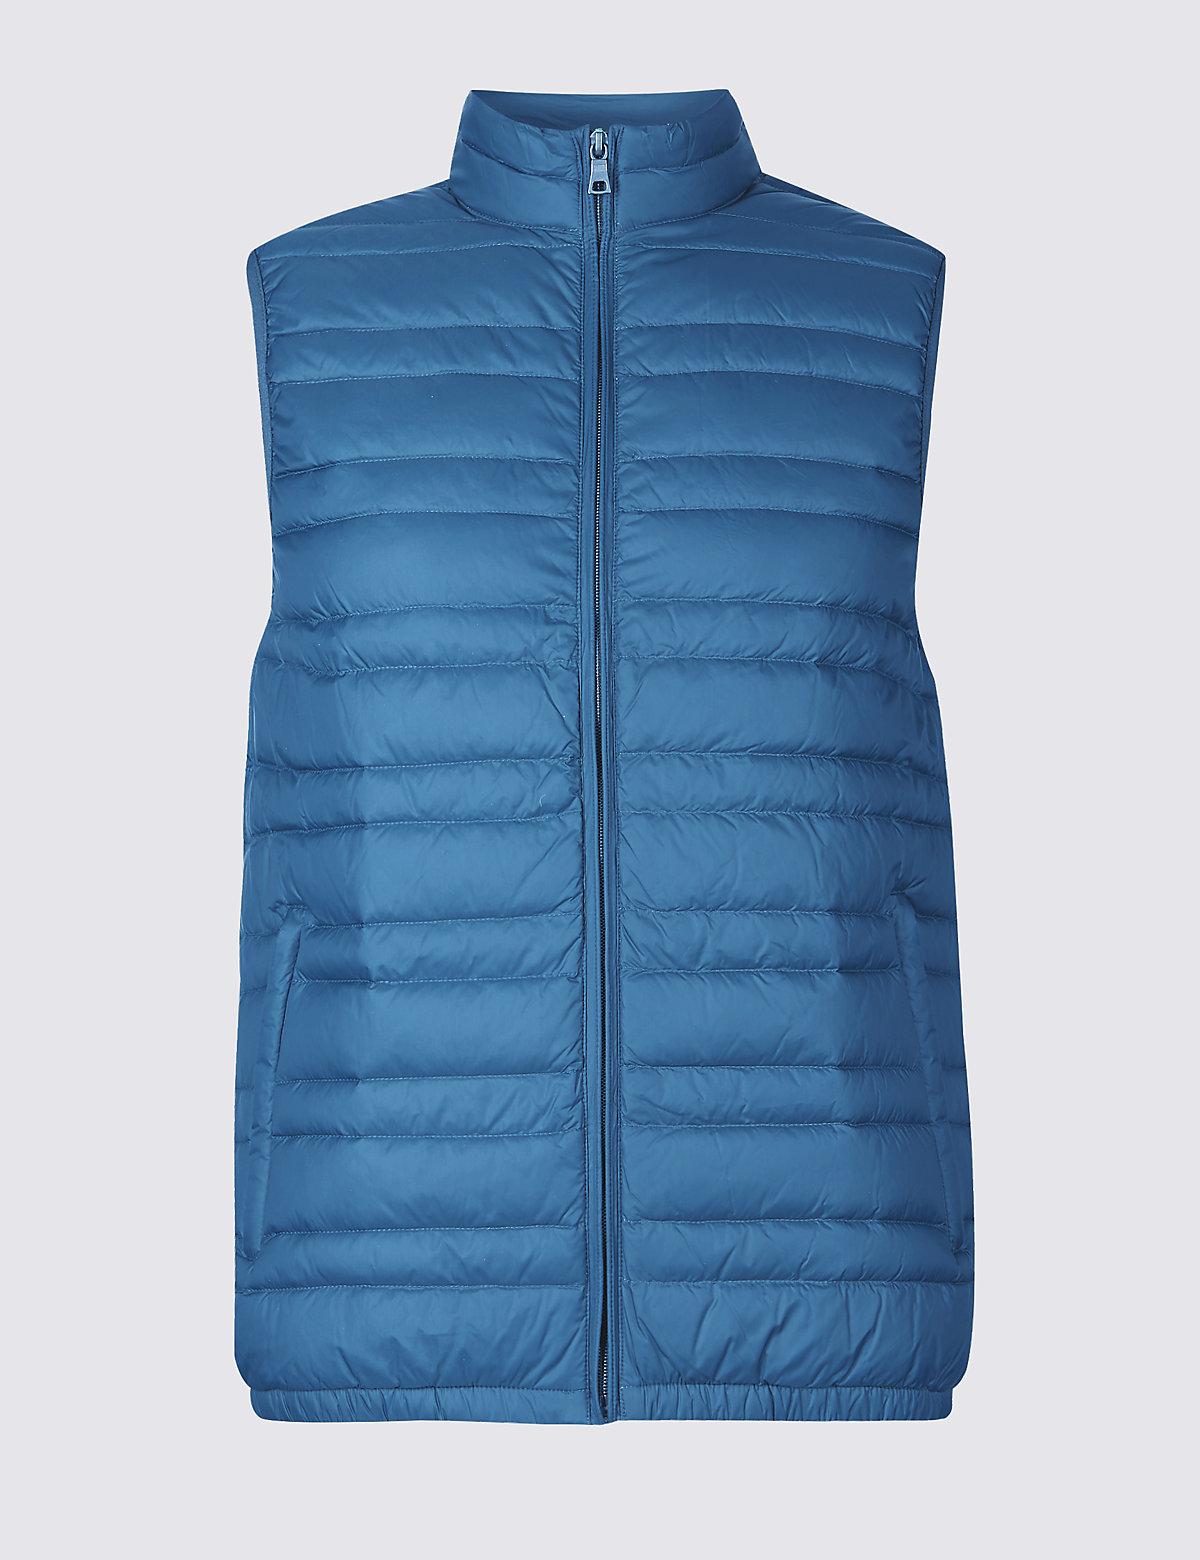 Жилетка мужская Down & Feather с технологией Stormwear™ M&S Collection. Цвет: морская глубина